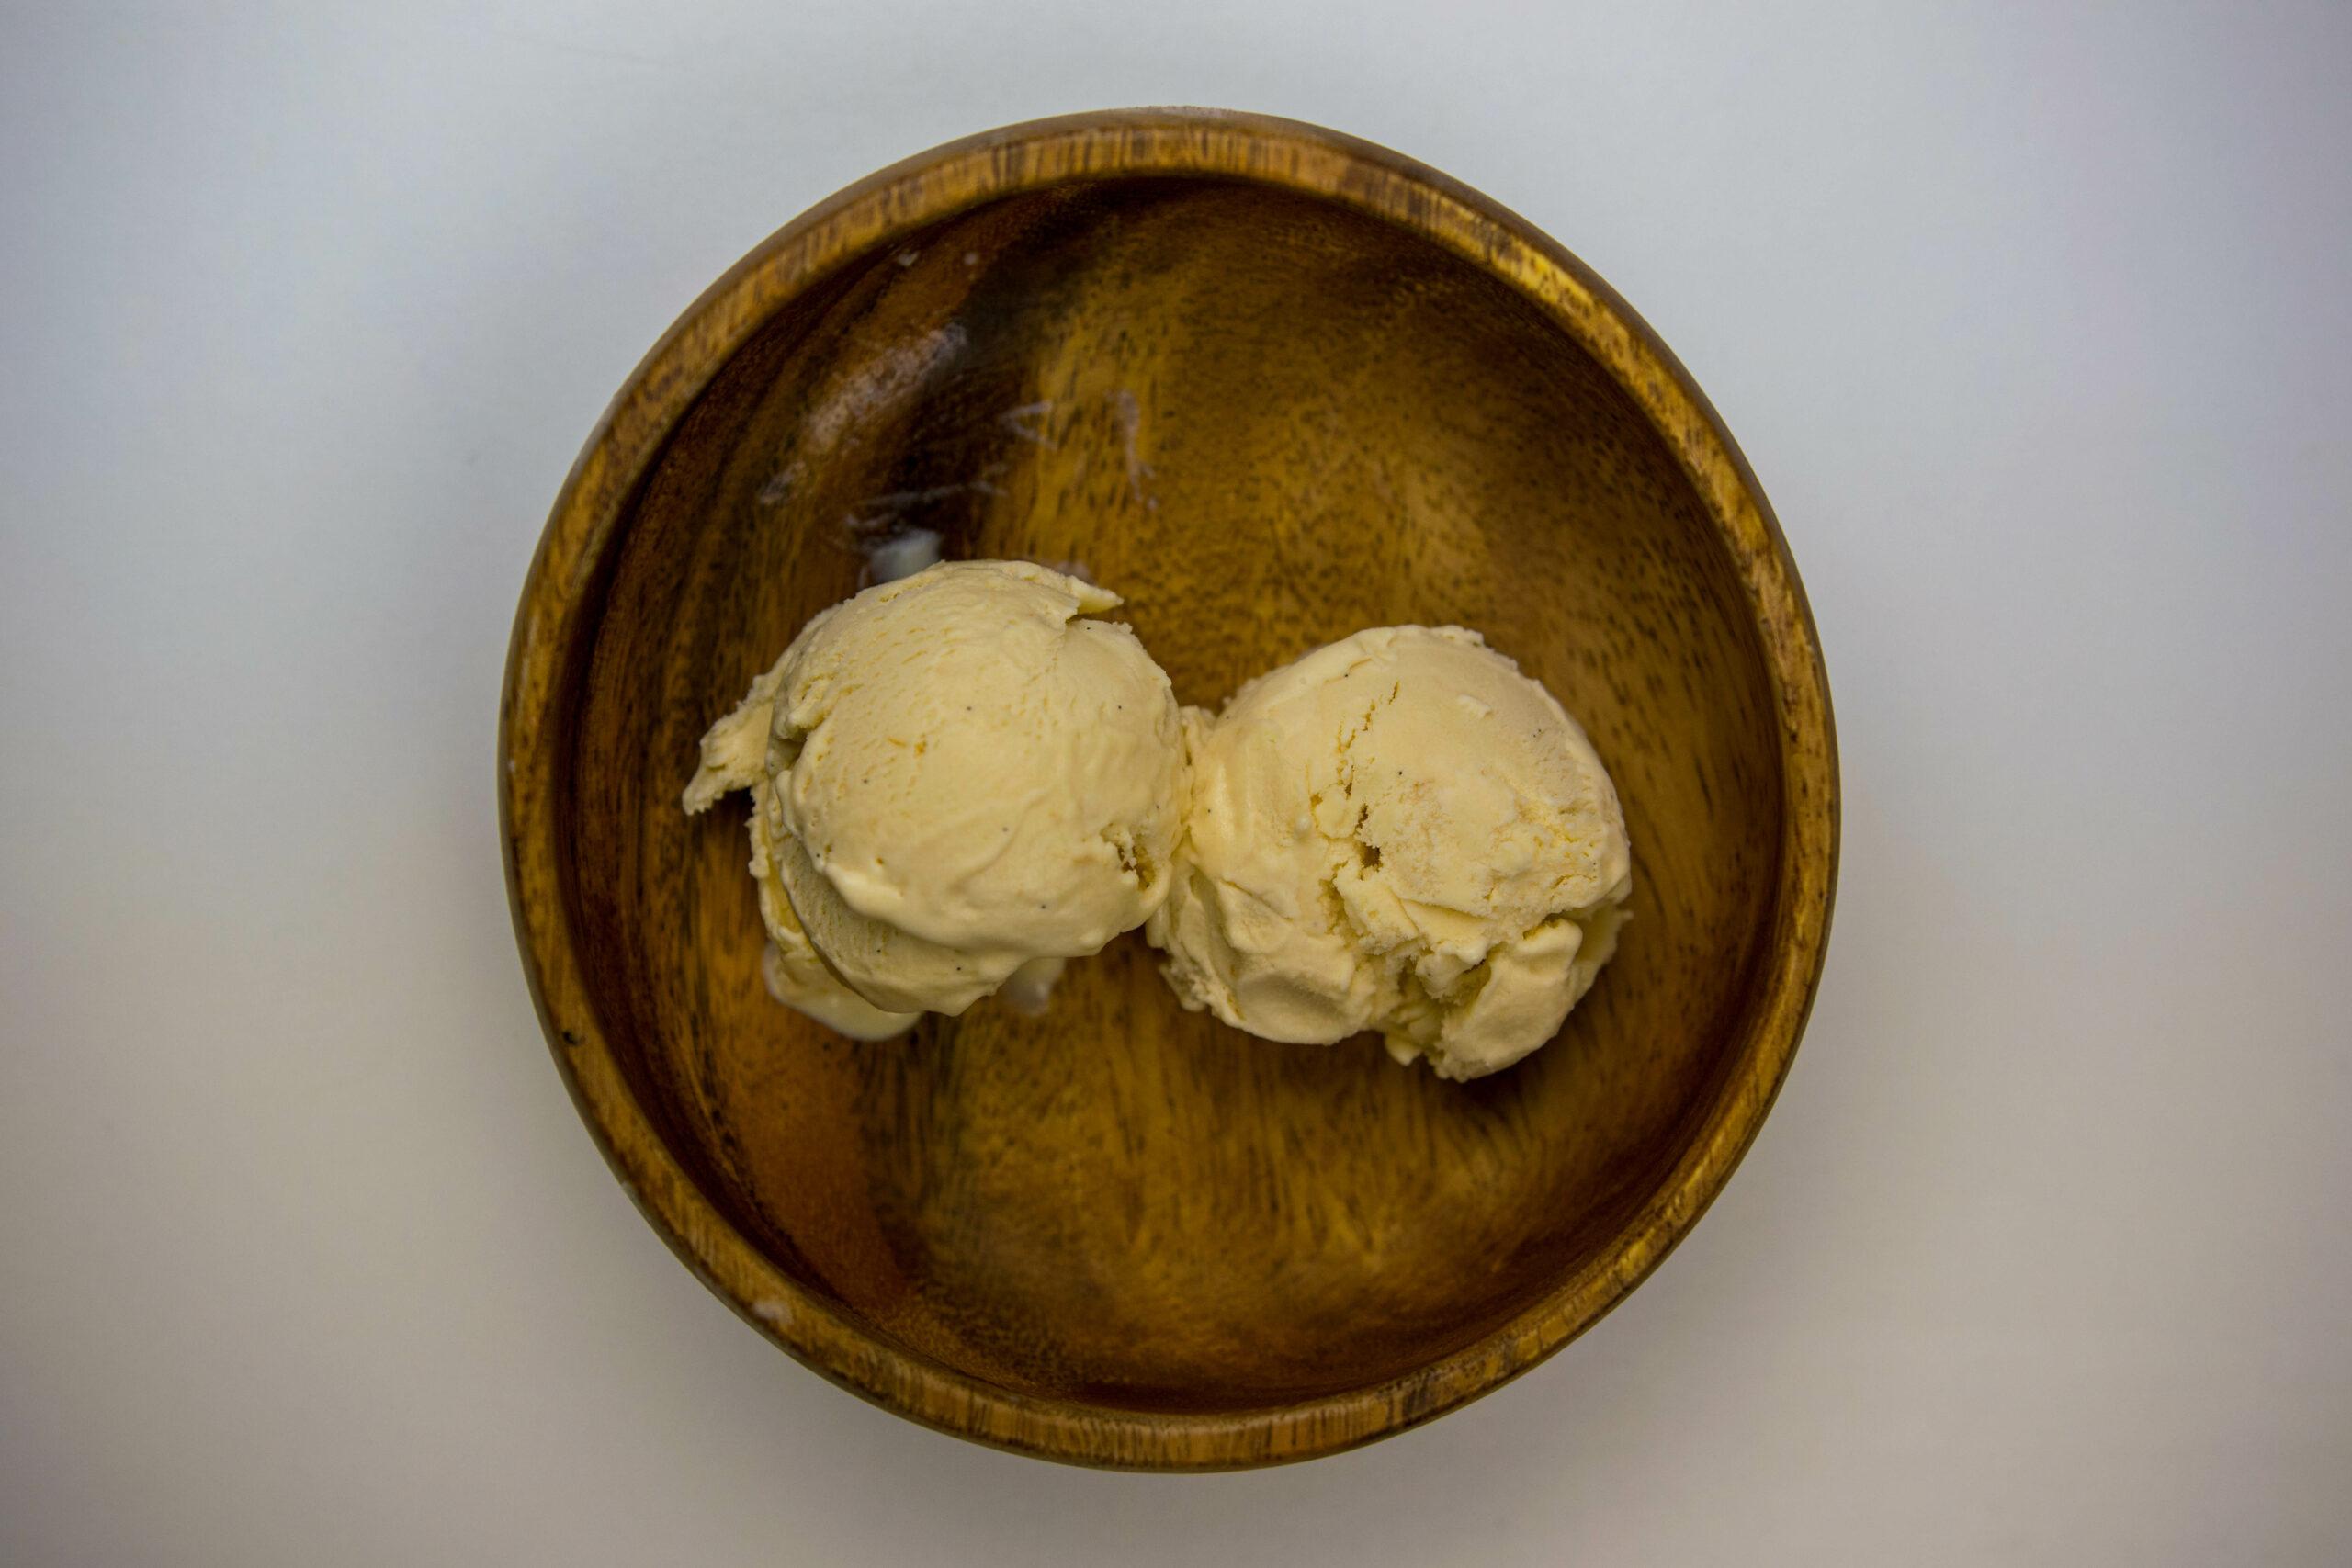 helado manzana a baja temperatura